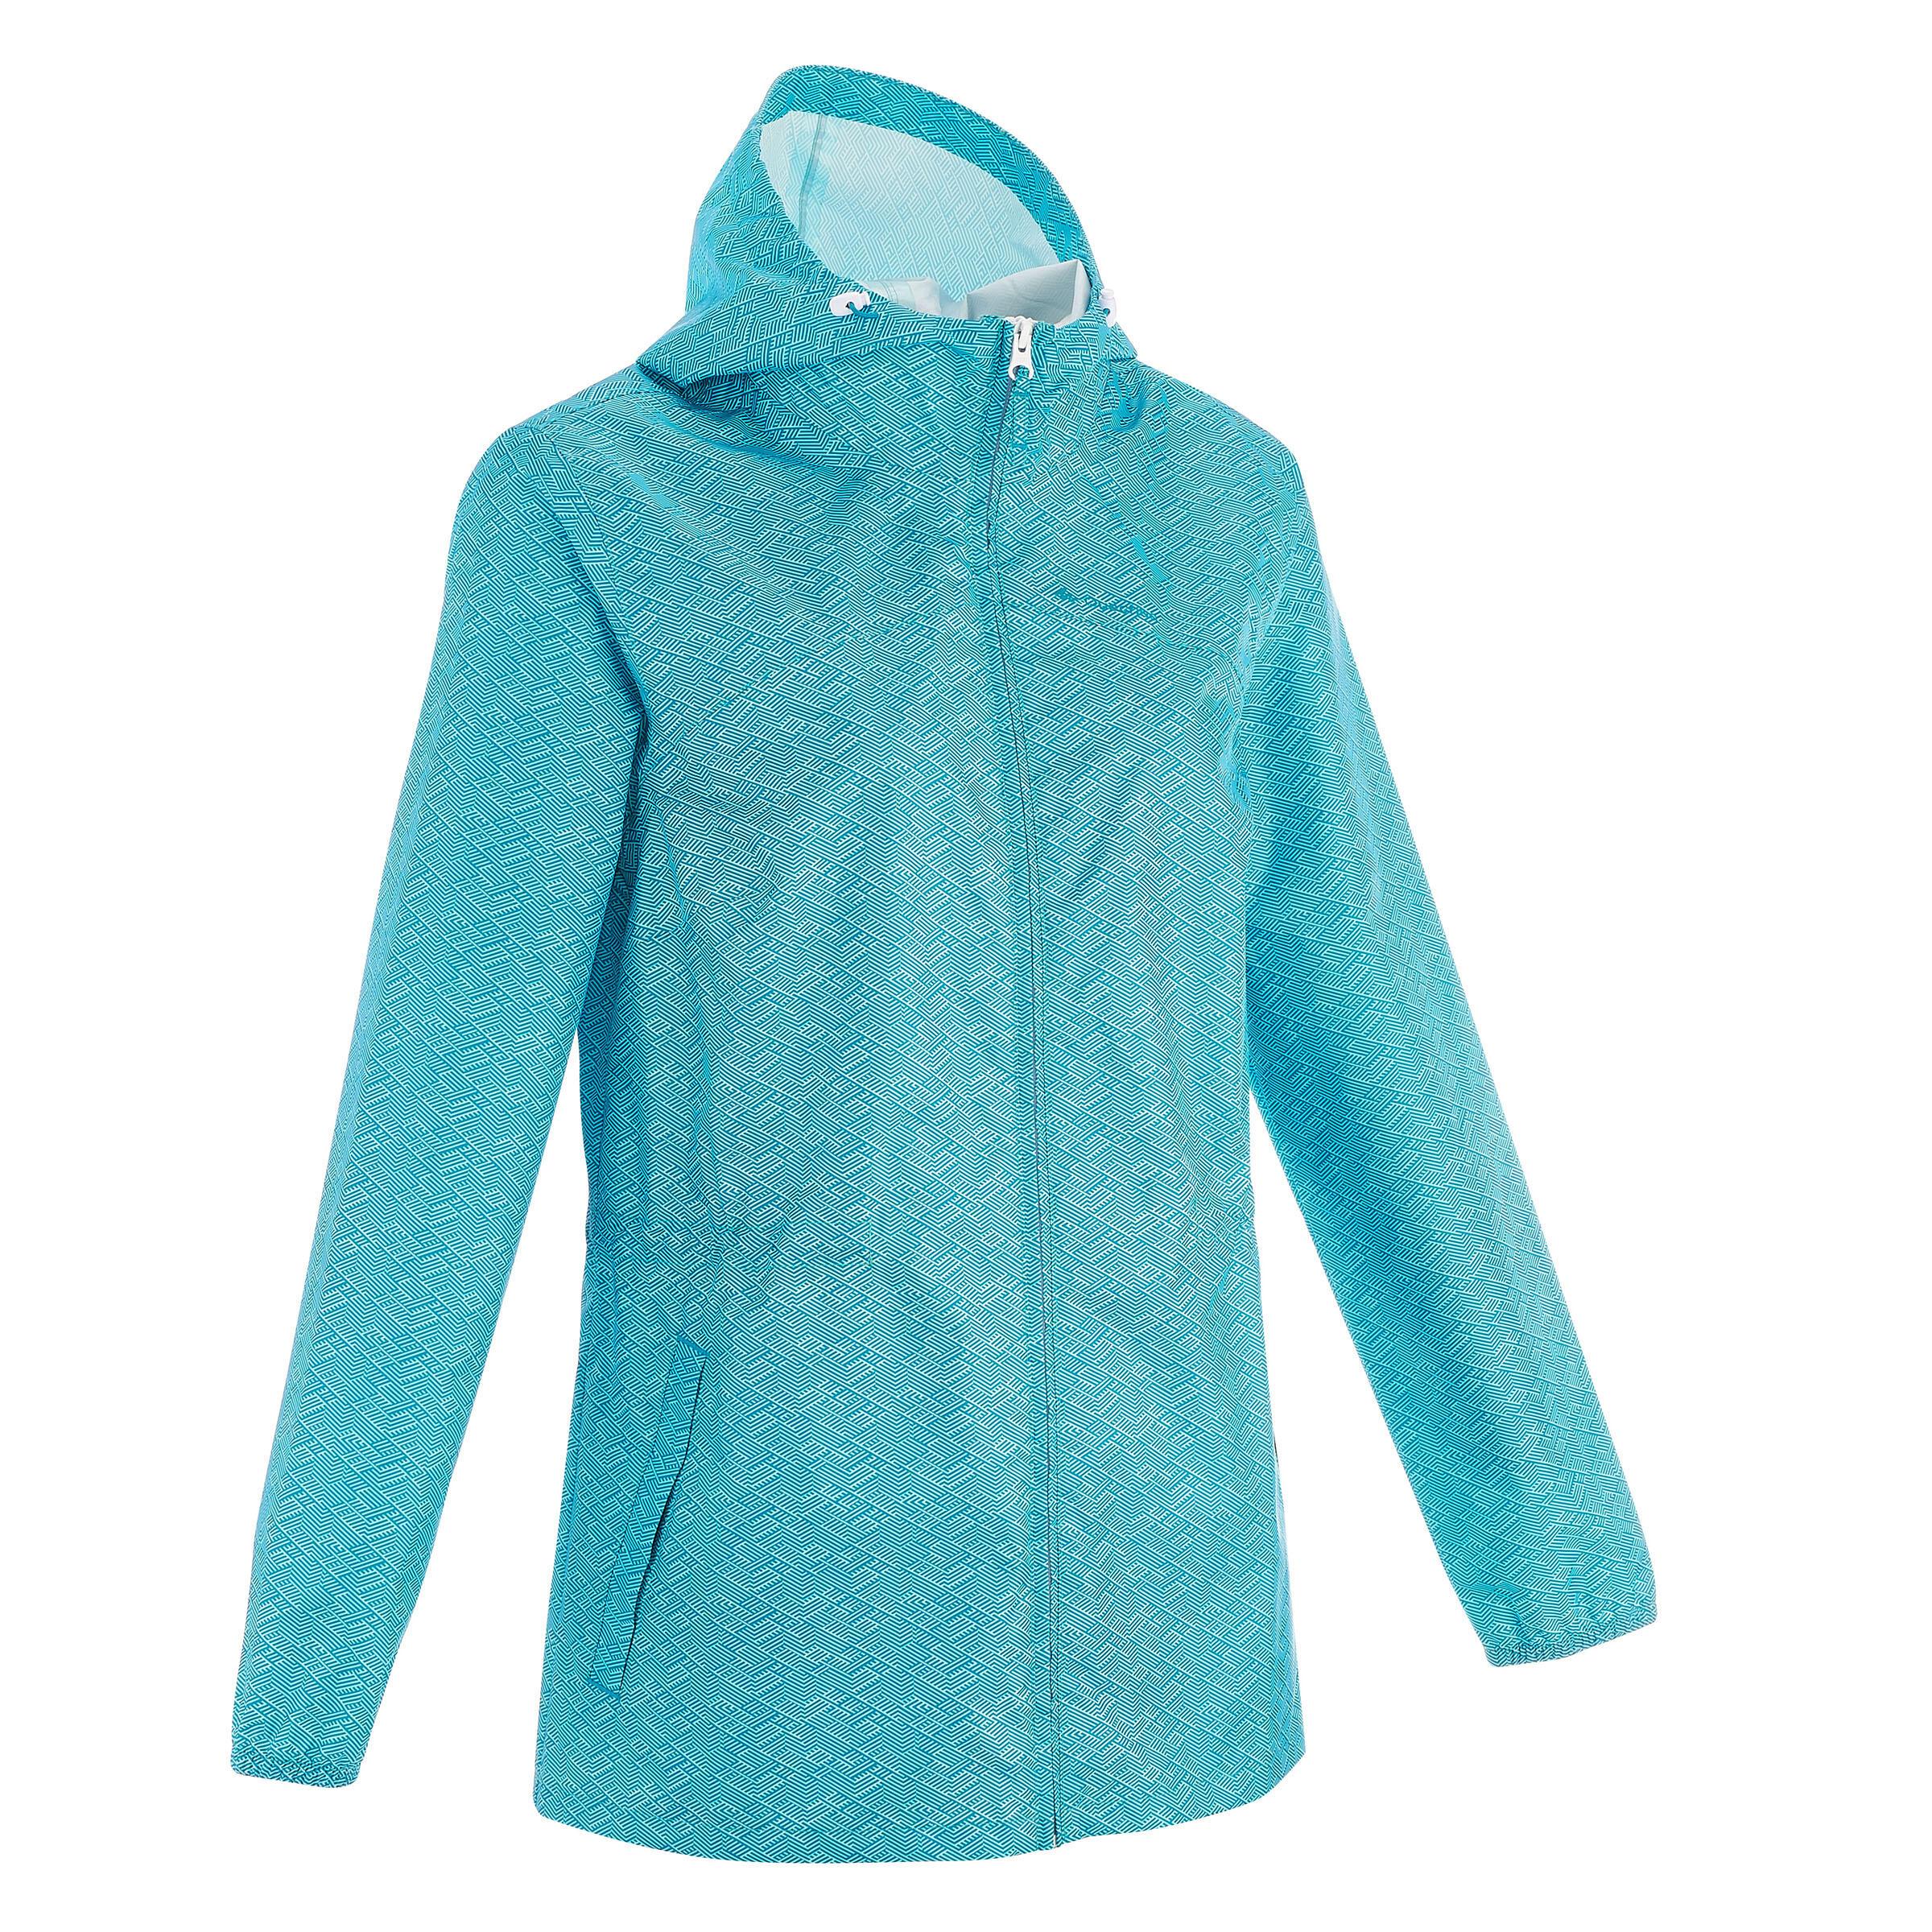 Regenjacke Naturwandern Raincut NH100 wasserdicht Reißverschluss Damen hellblau | Sportbekleidung > Sportjacken > Regenjacken | Quechua